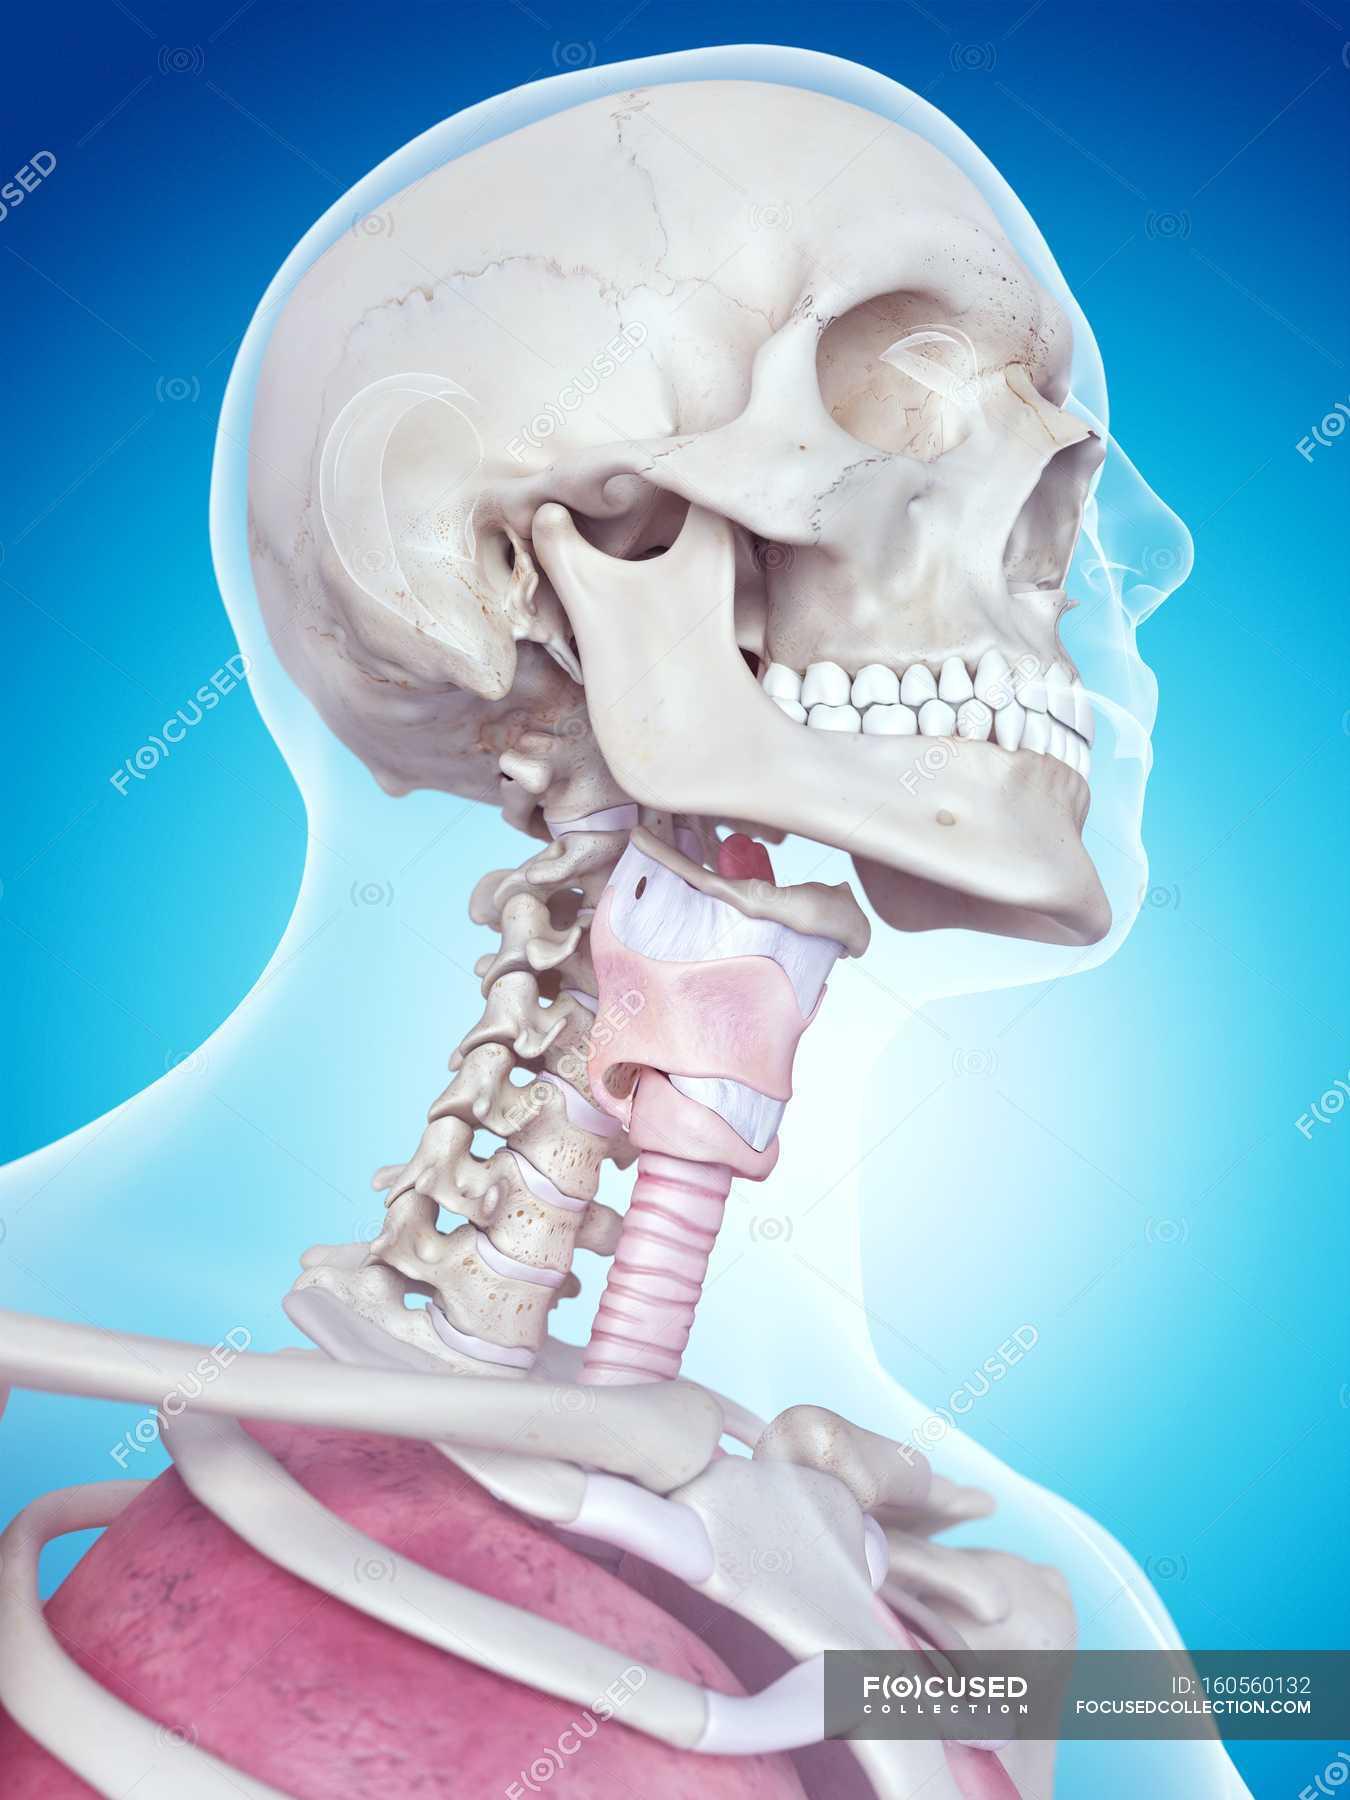 Human larynx anatomy — Stock Photo | #160560132